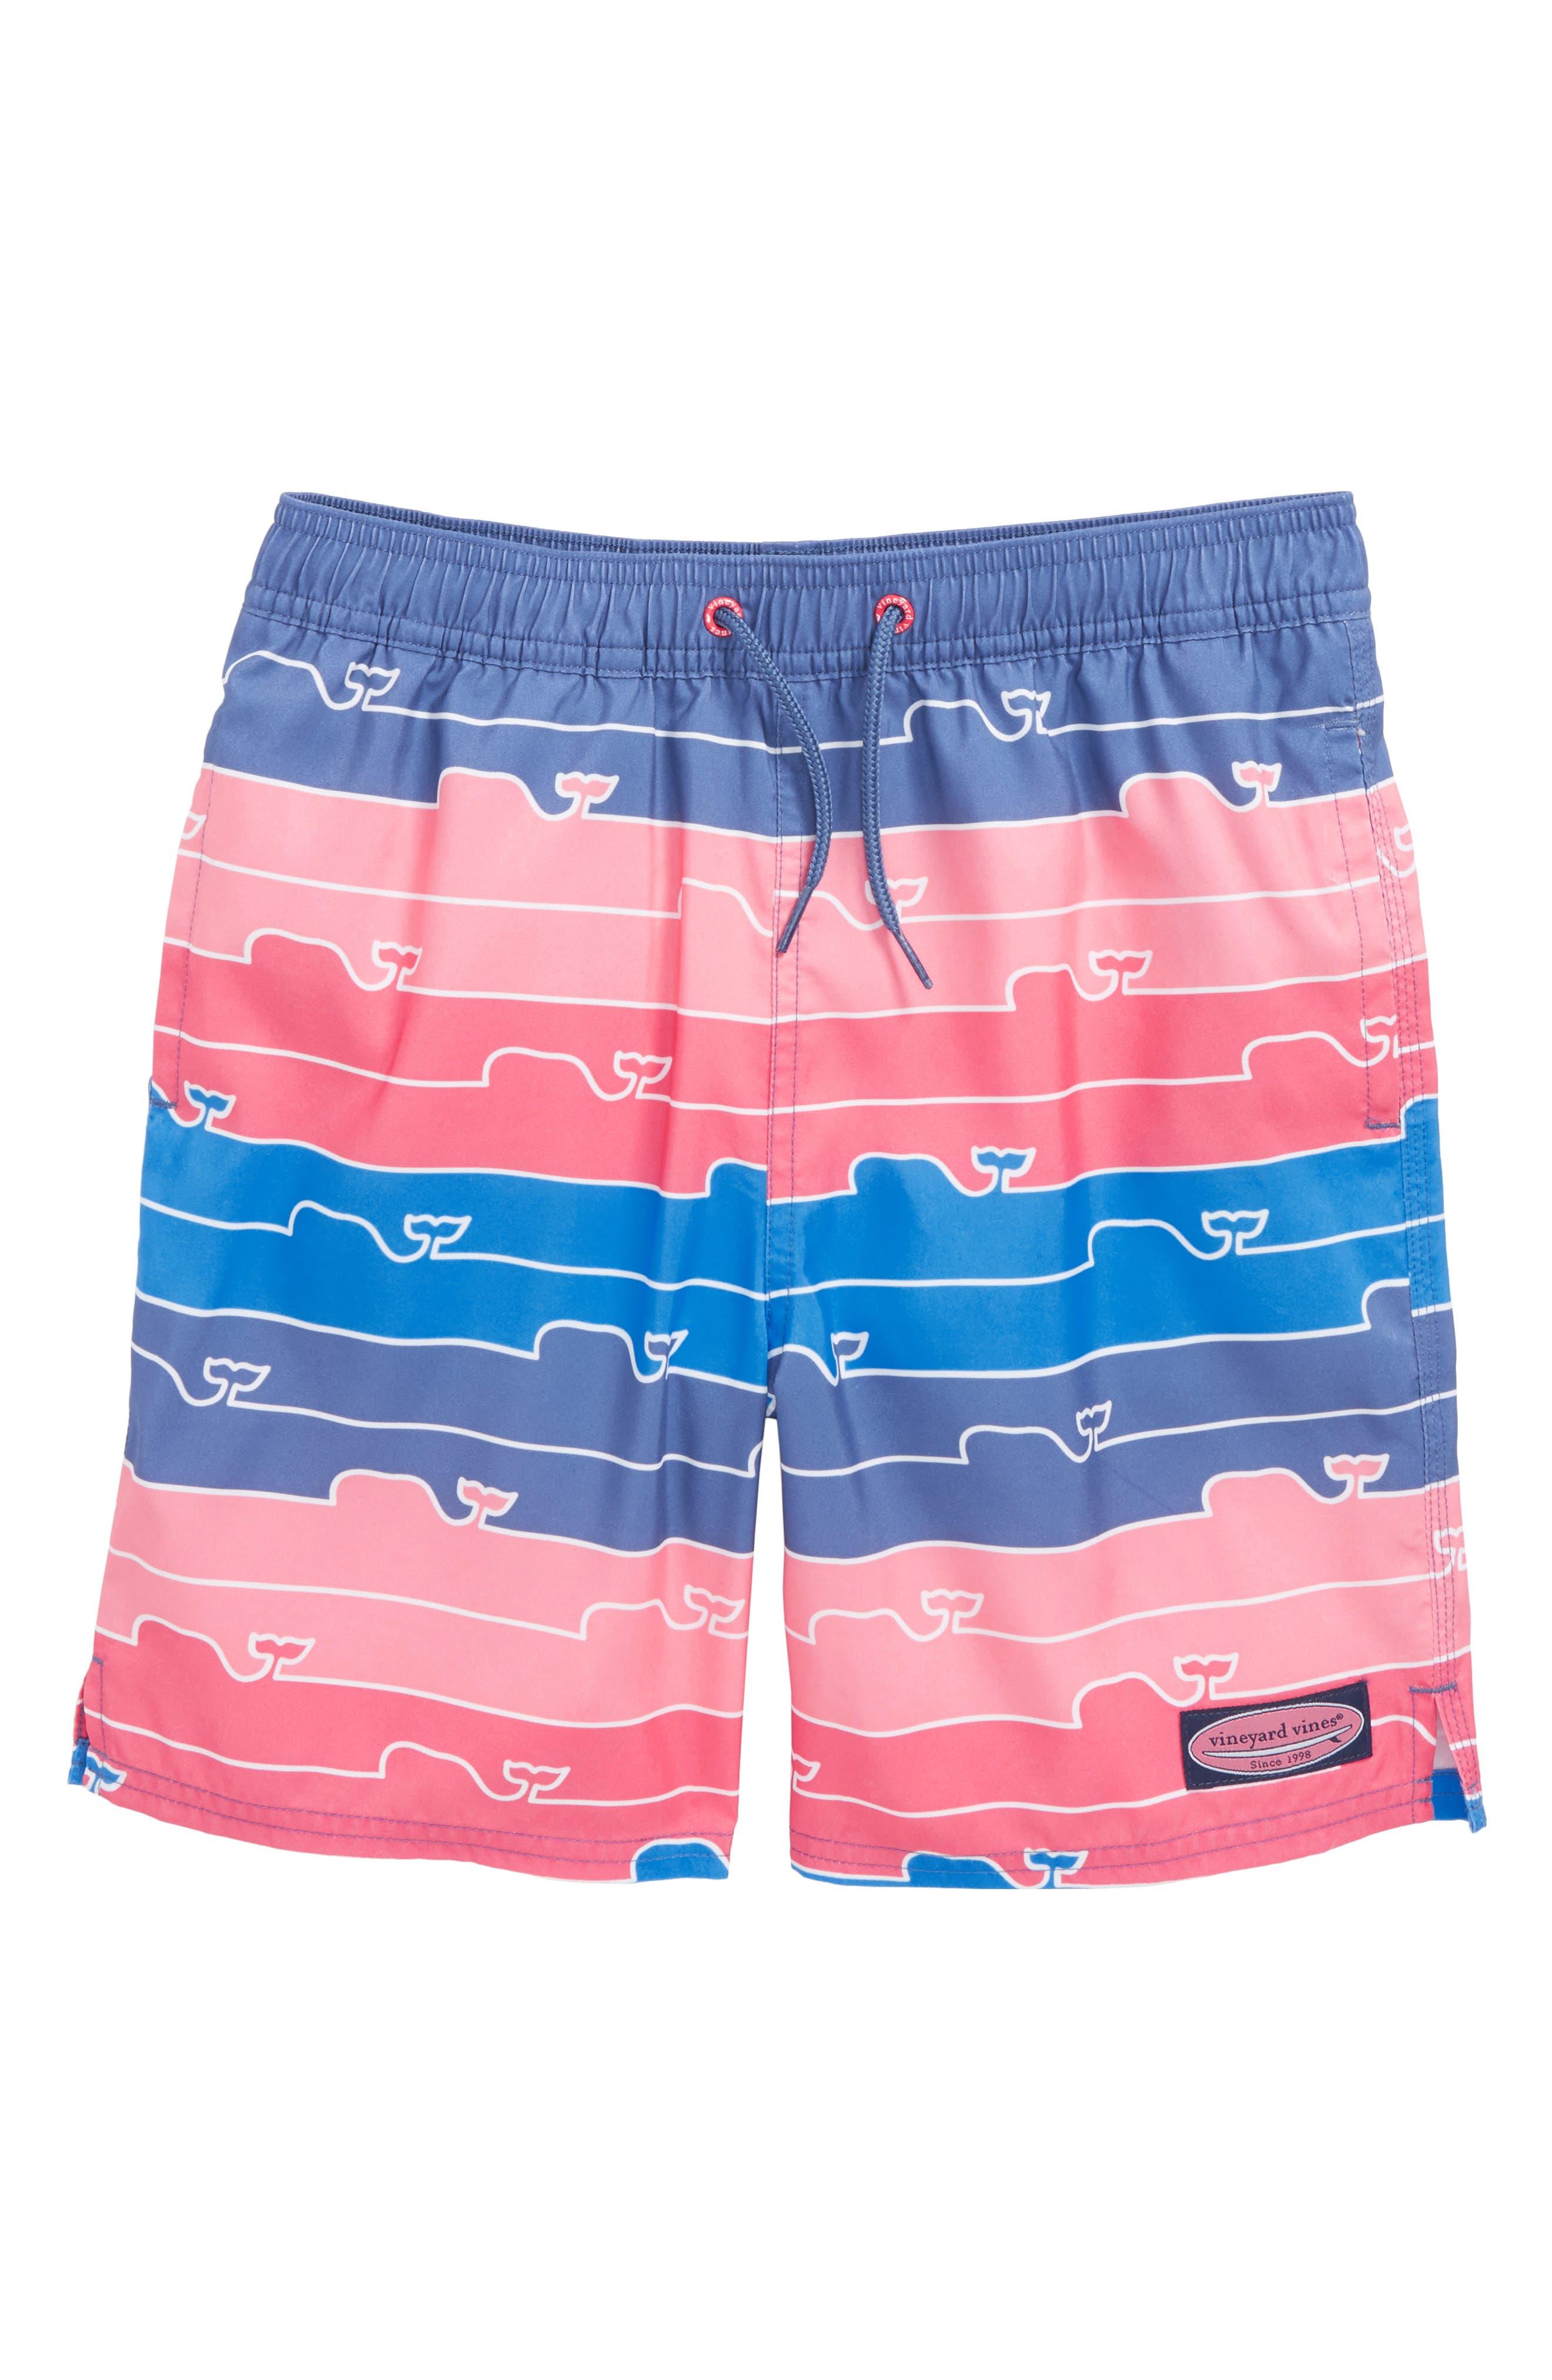 Chappy Whale Line Swim Trunks,                         Main,                         color, 461